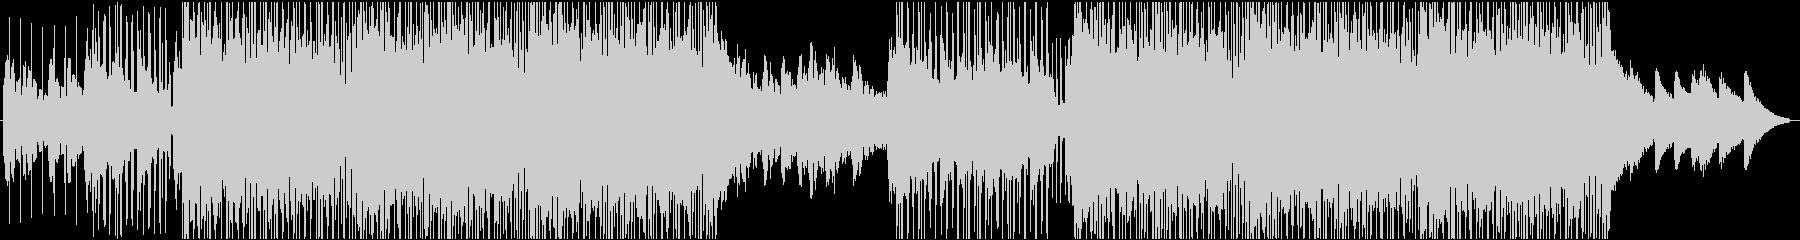 Soft EDM's unreproduced waveform